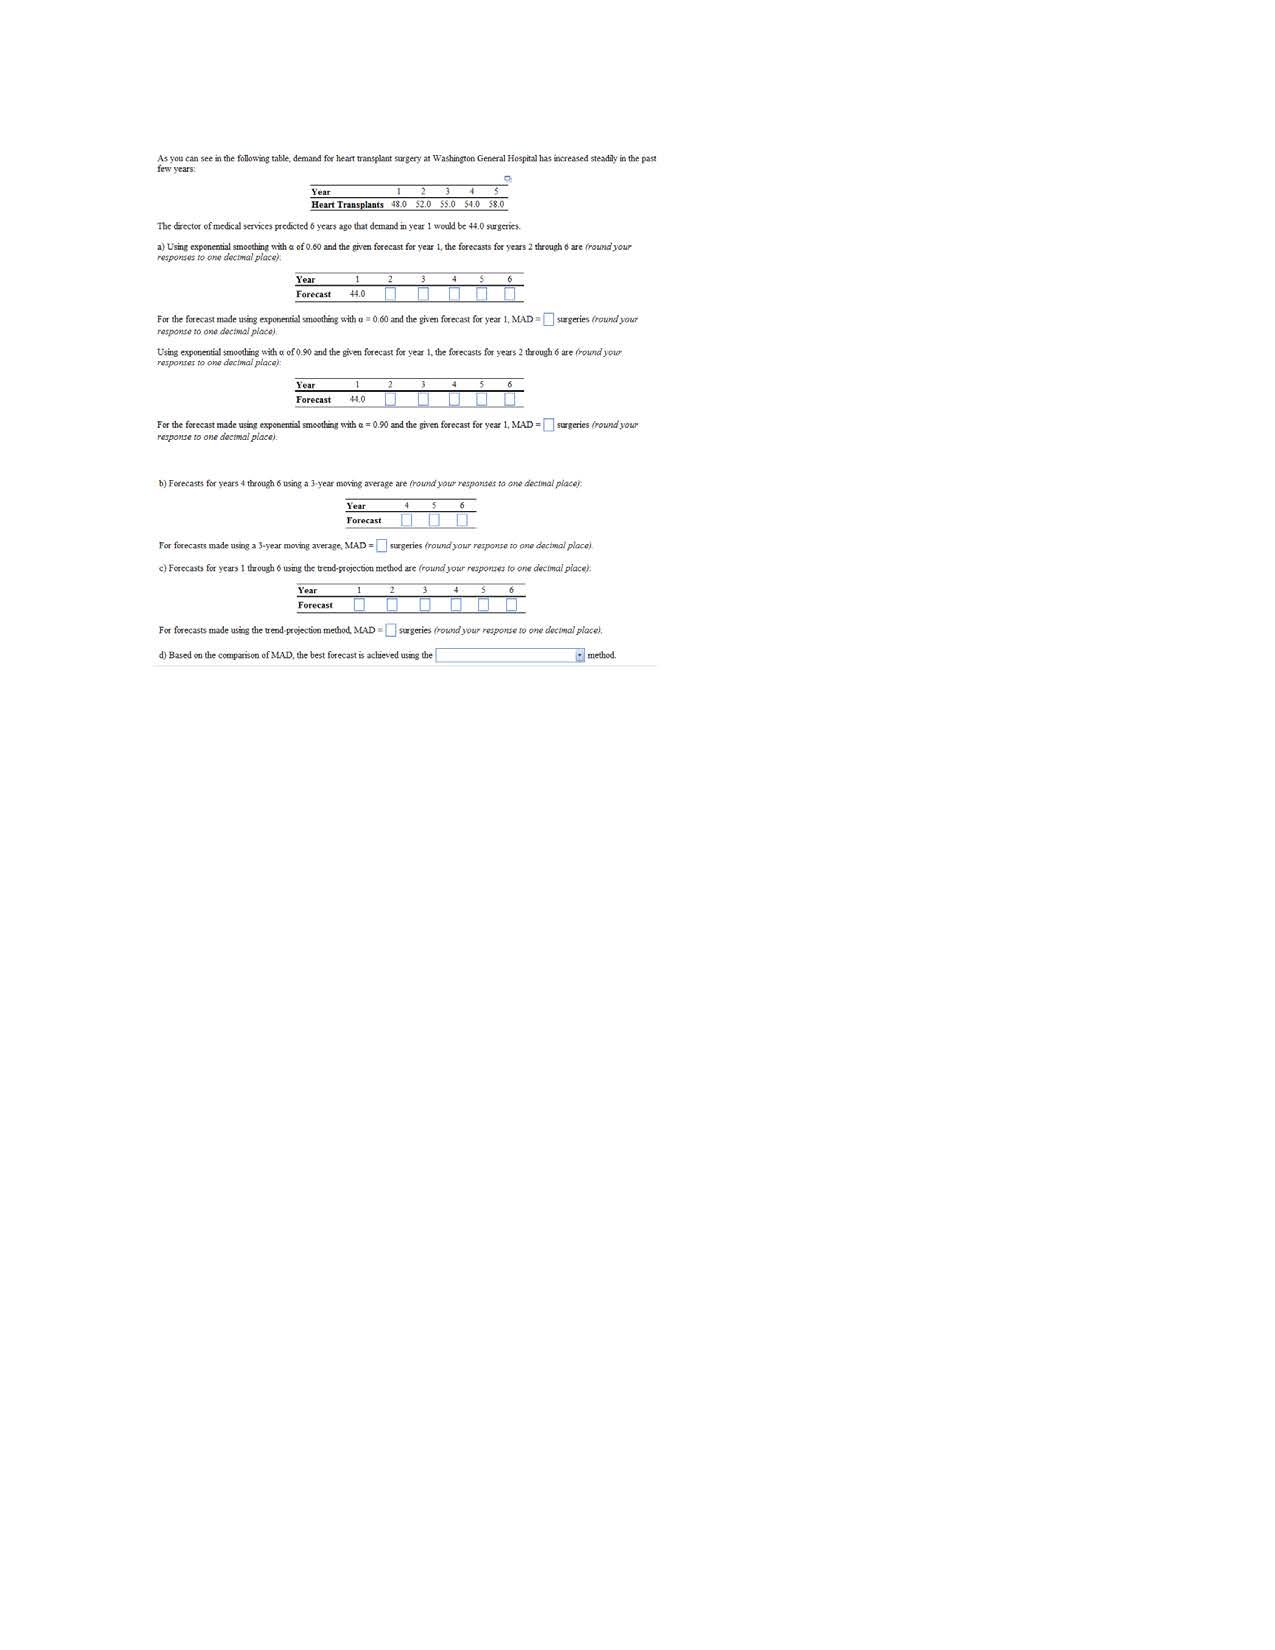 operations management homework help aggregate pla com operations management homework help